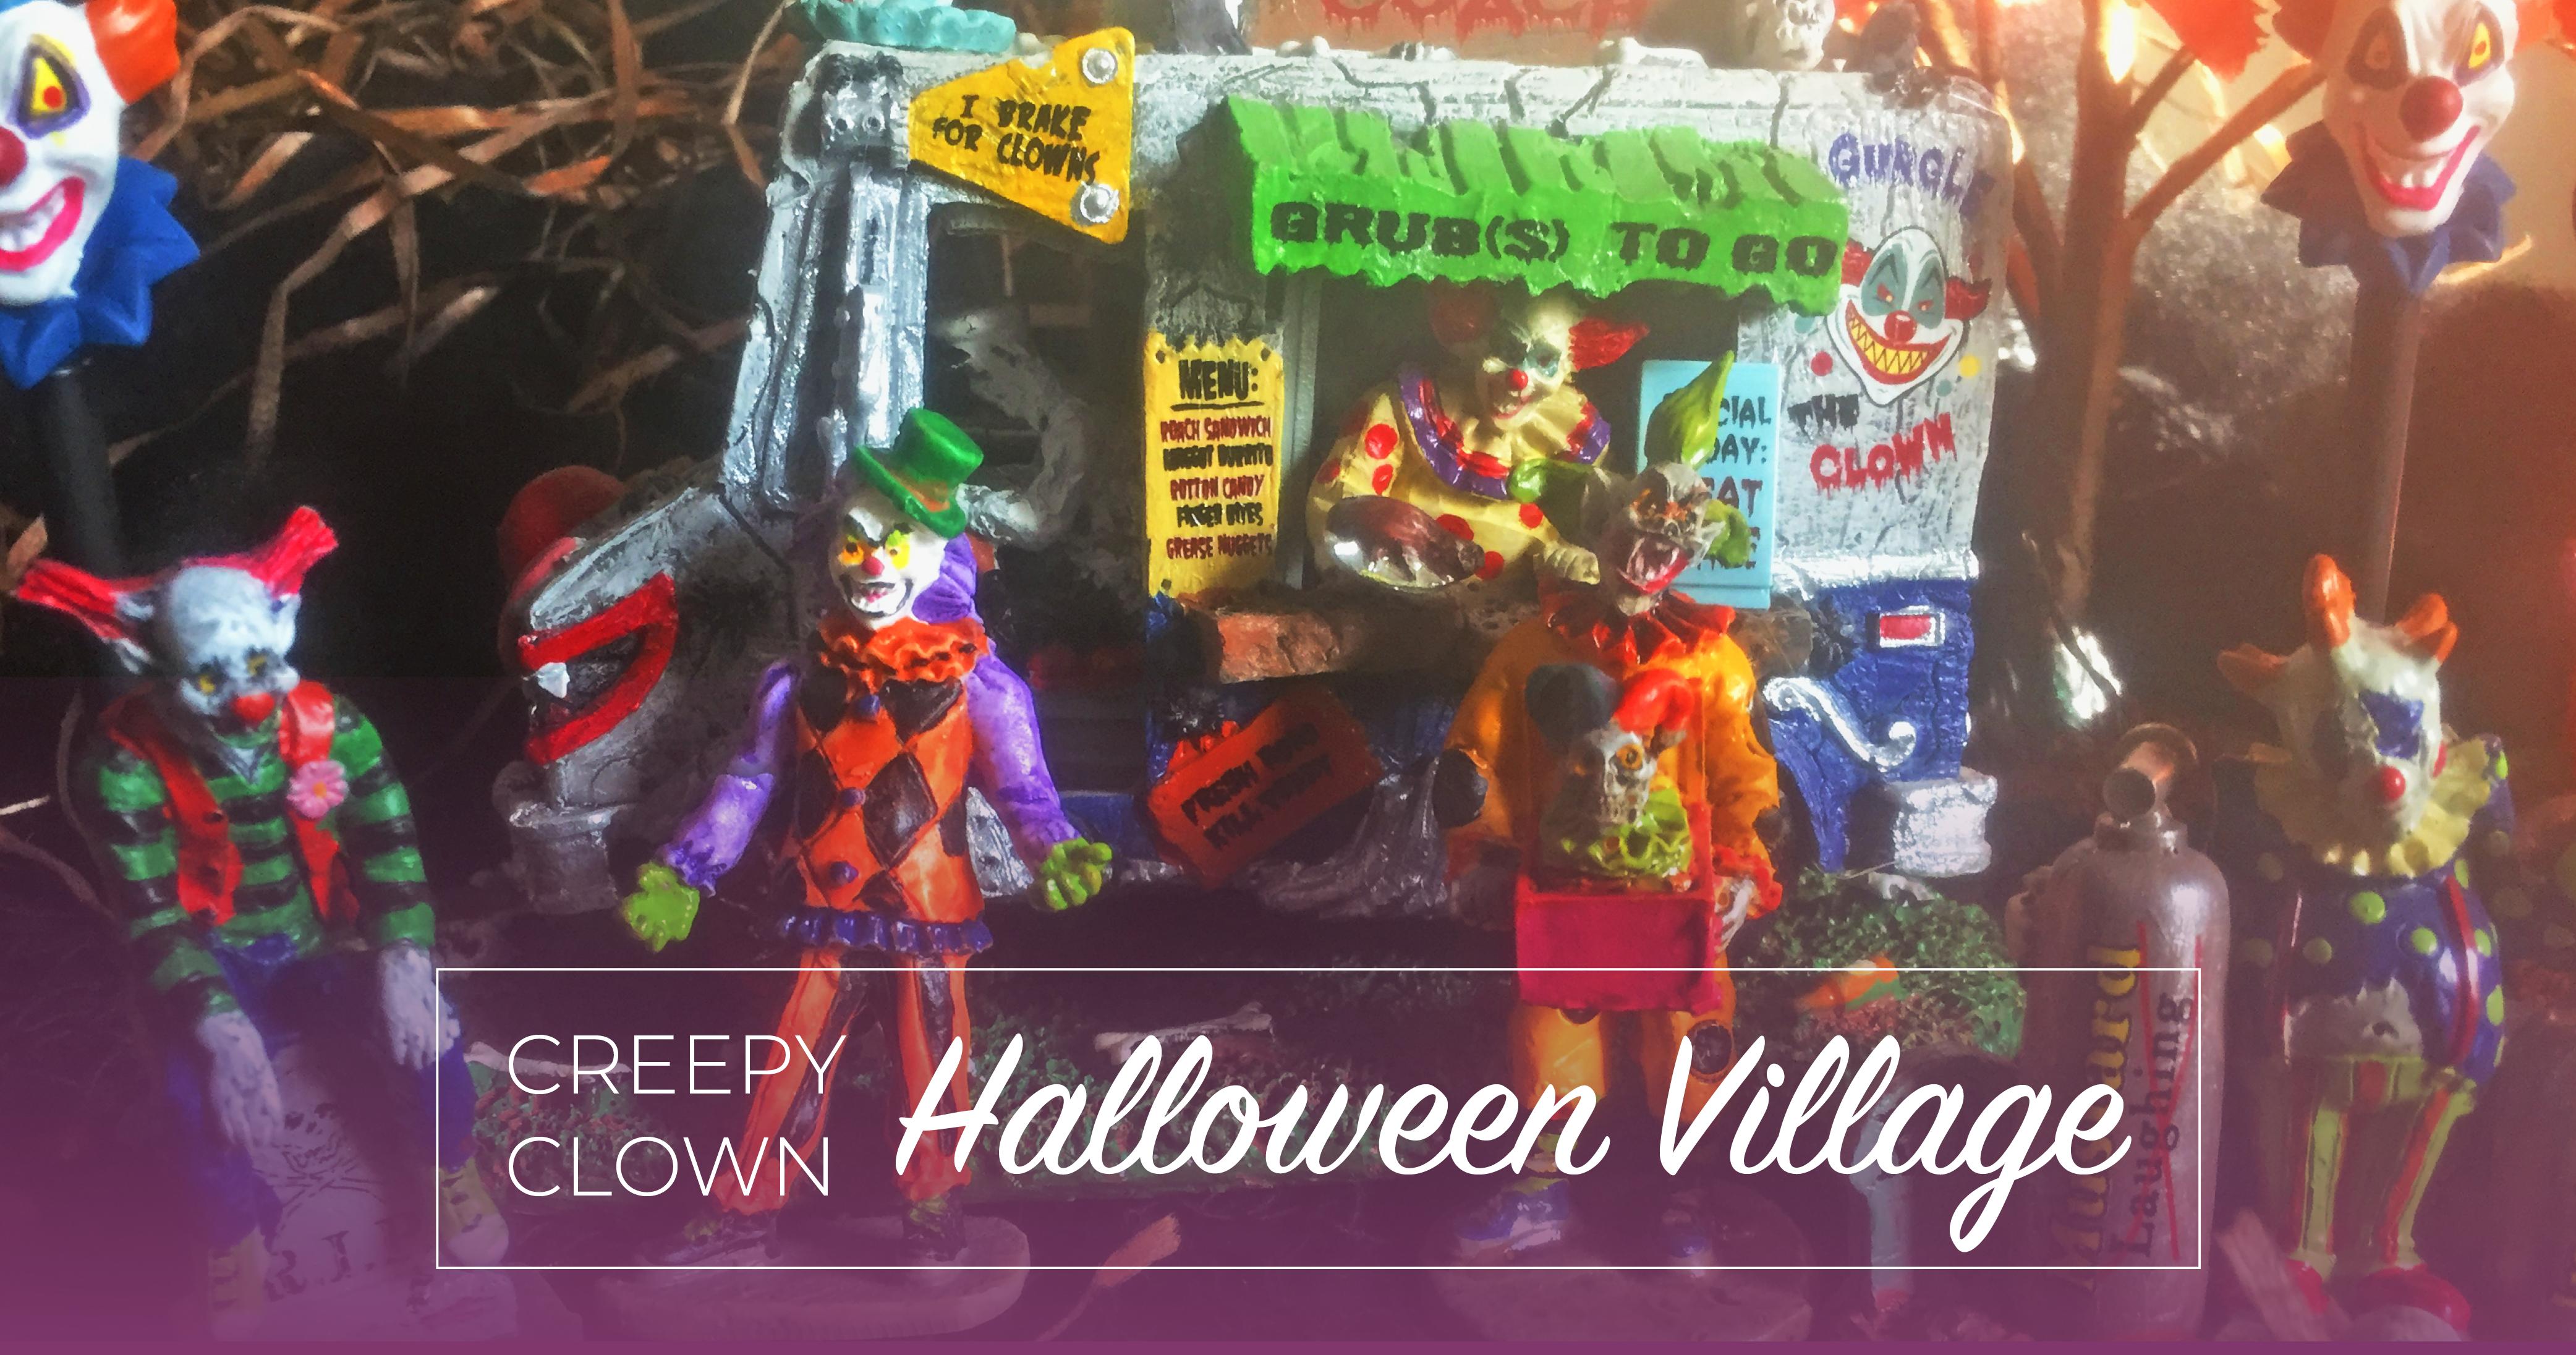 7 Tips for a Spooktacular DIY Halloween Village